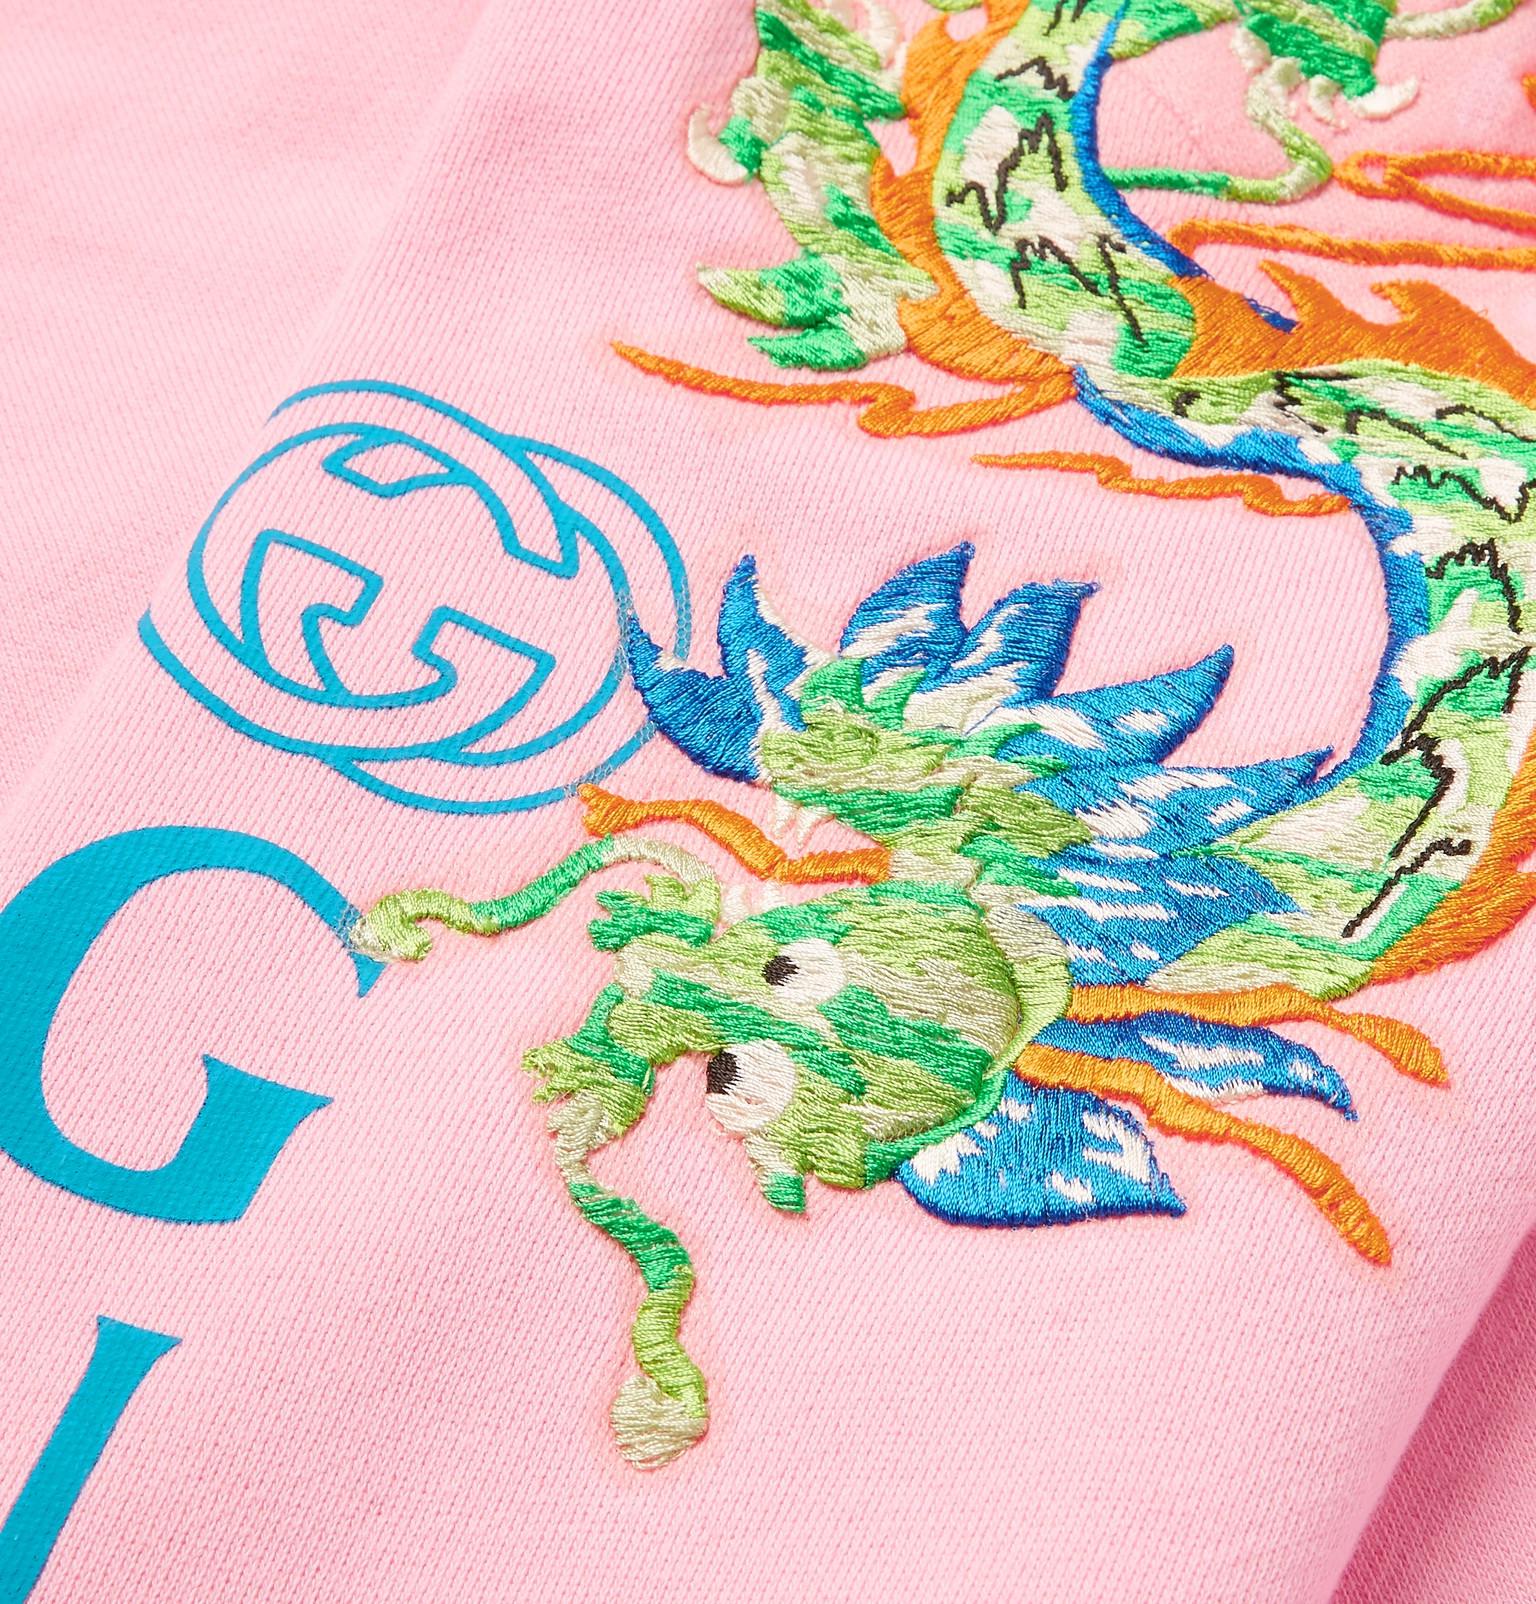 d0bbbd37b Gucci - Appliquéd Logo-Print Loopback Cotton-Jersey Hoodie